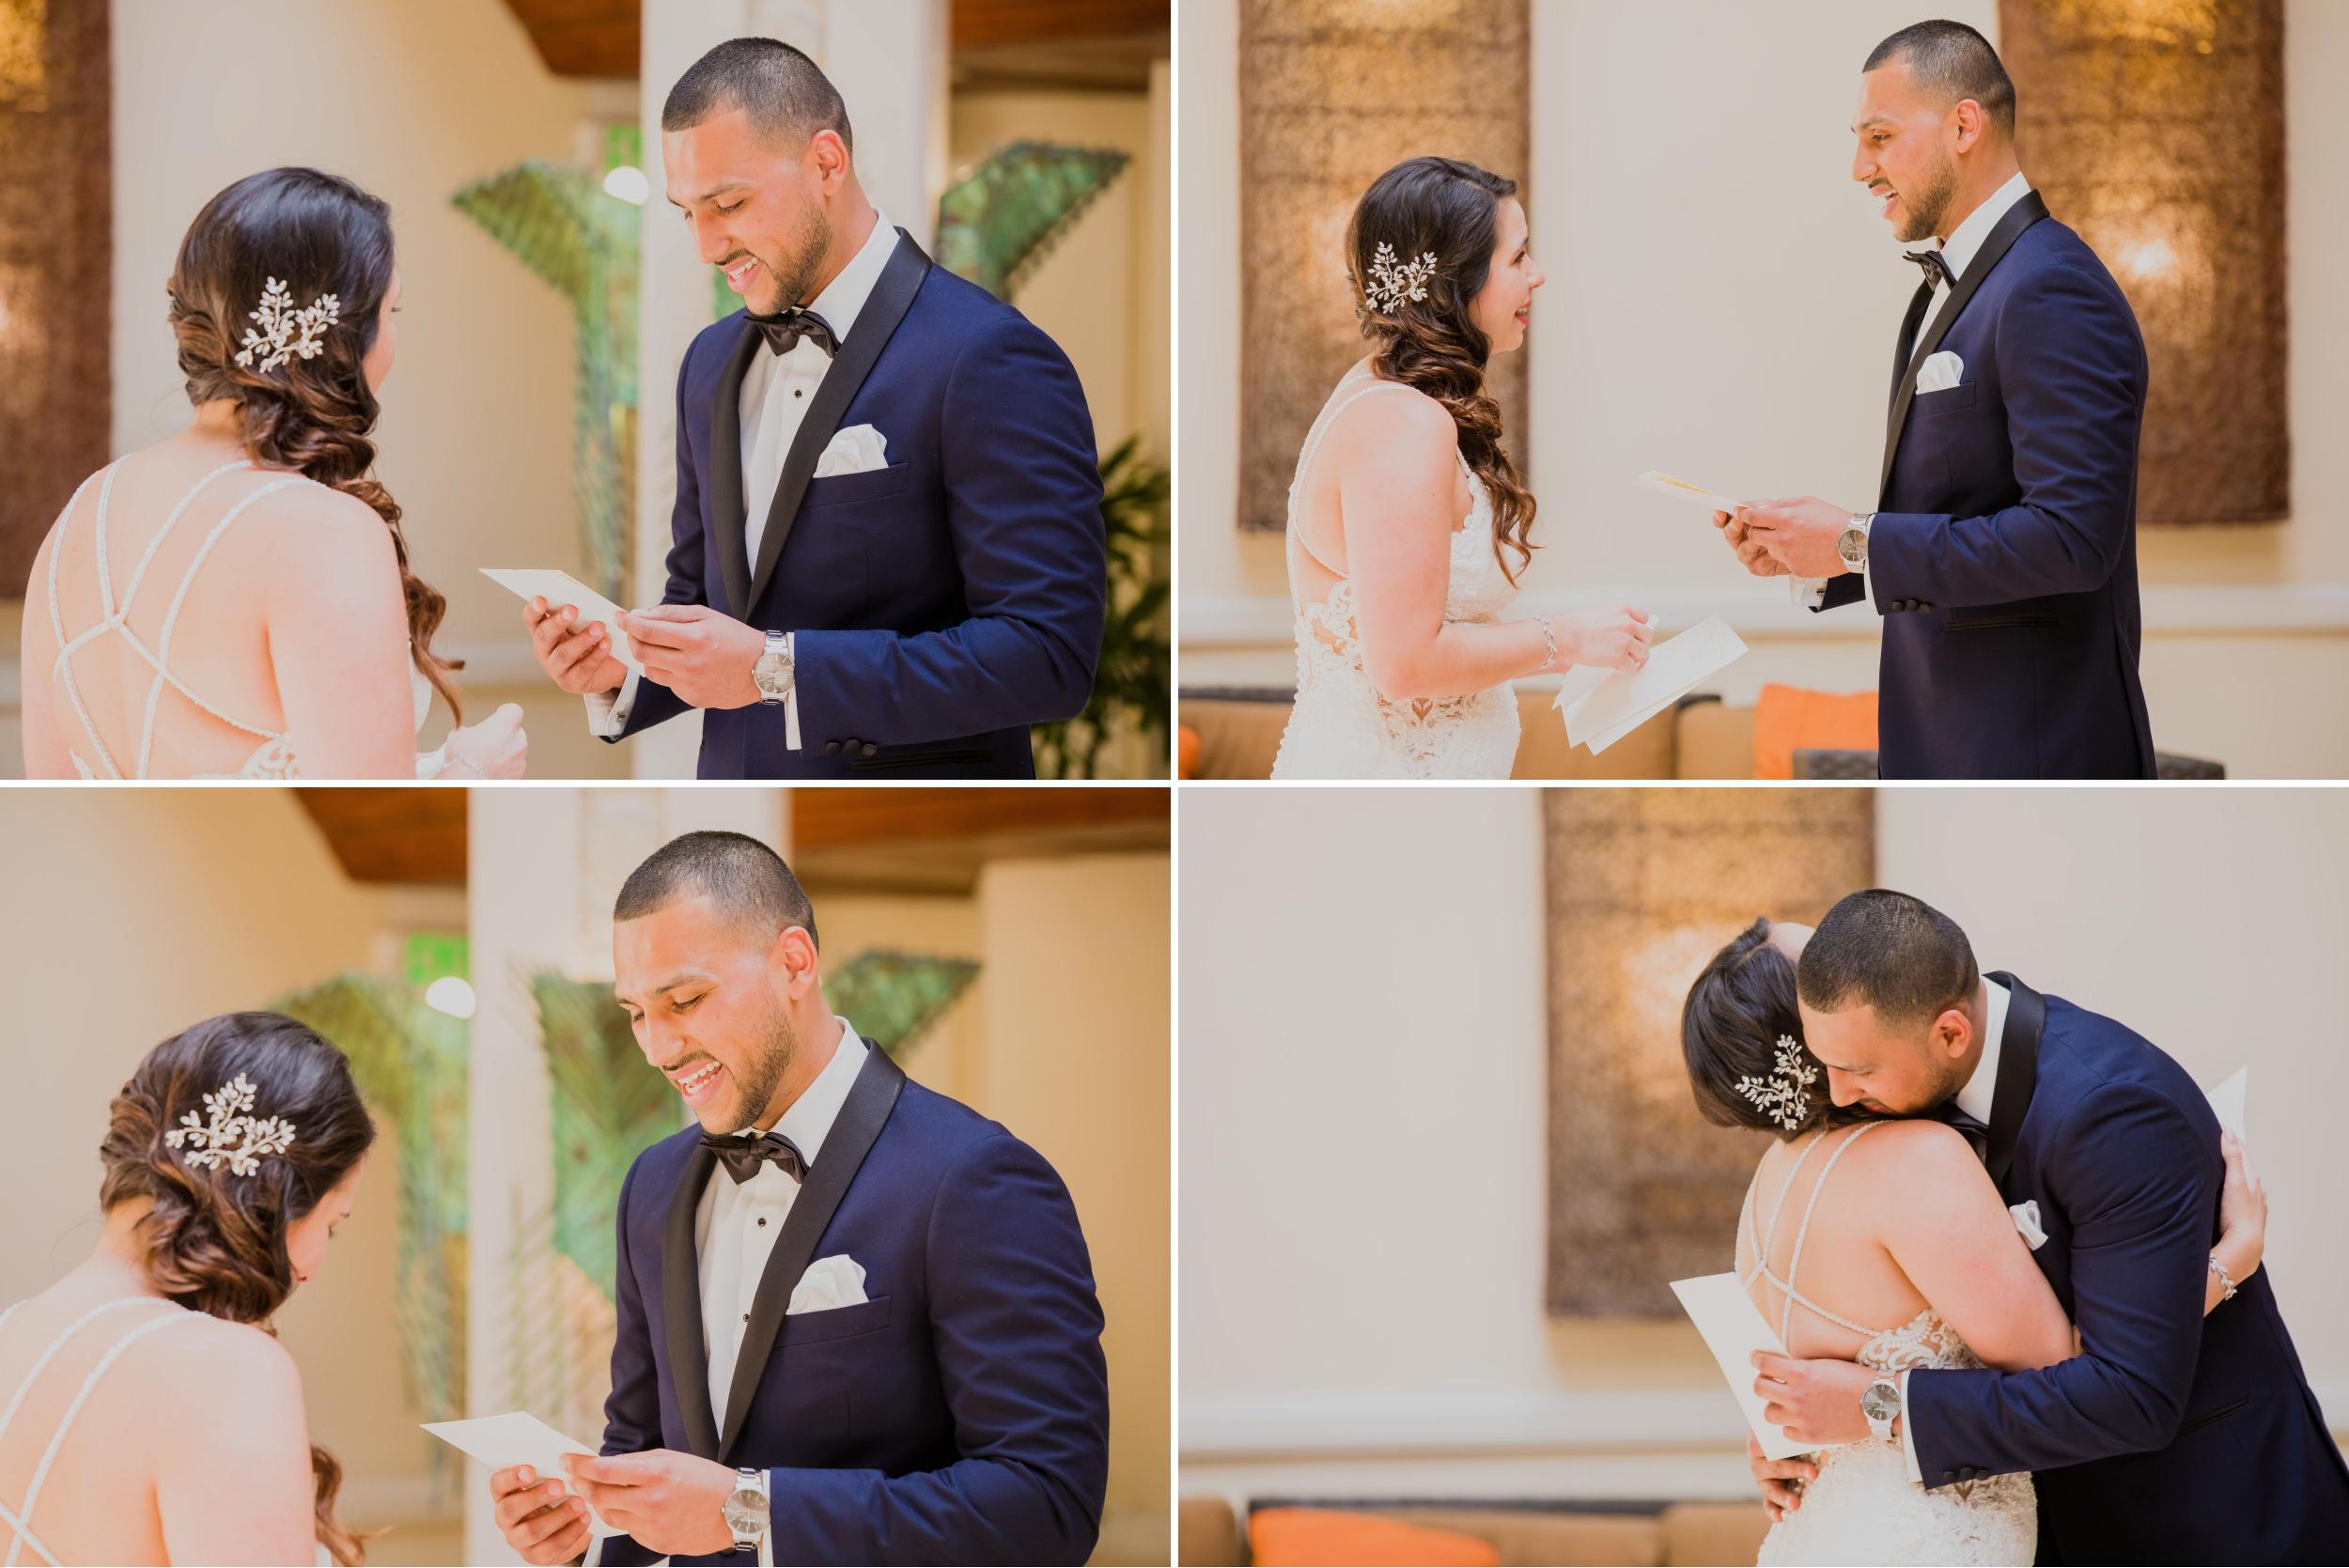 Wedding - Rusty Pelican - Key Biscayne - Santy Martinez Photography 17.jpg